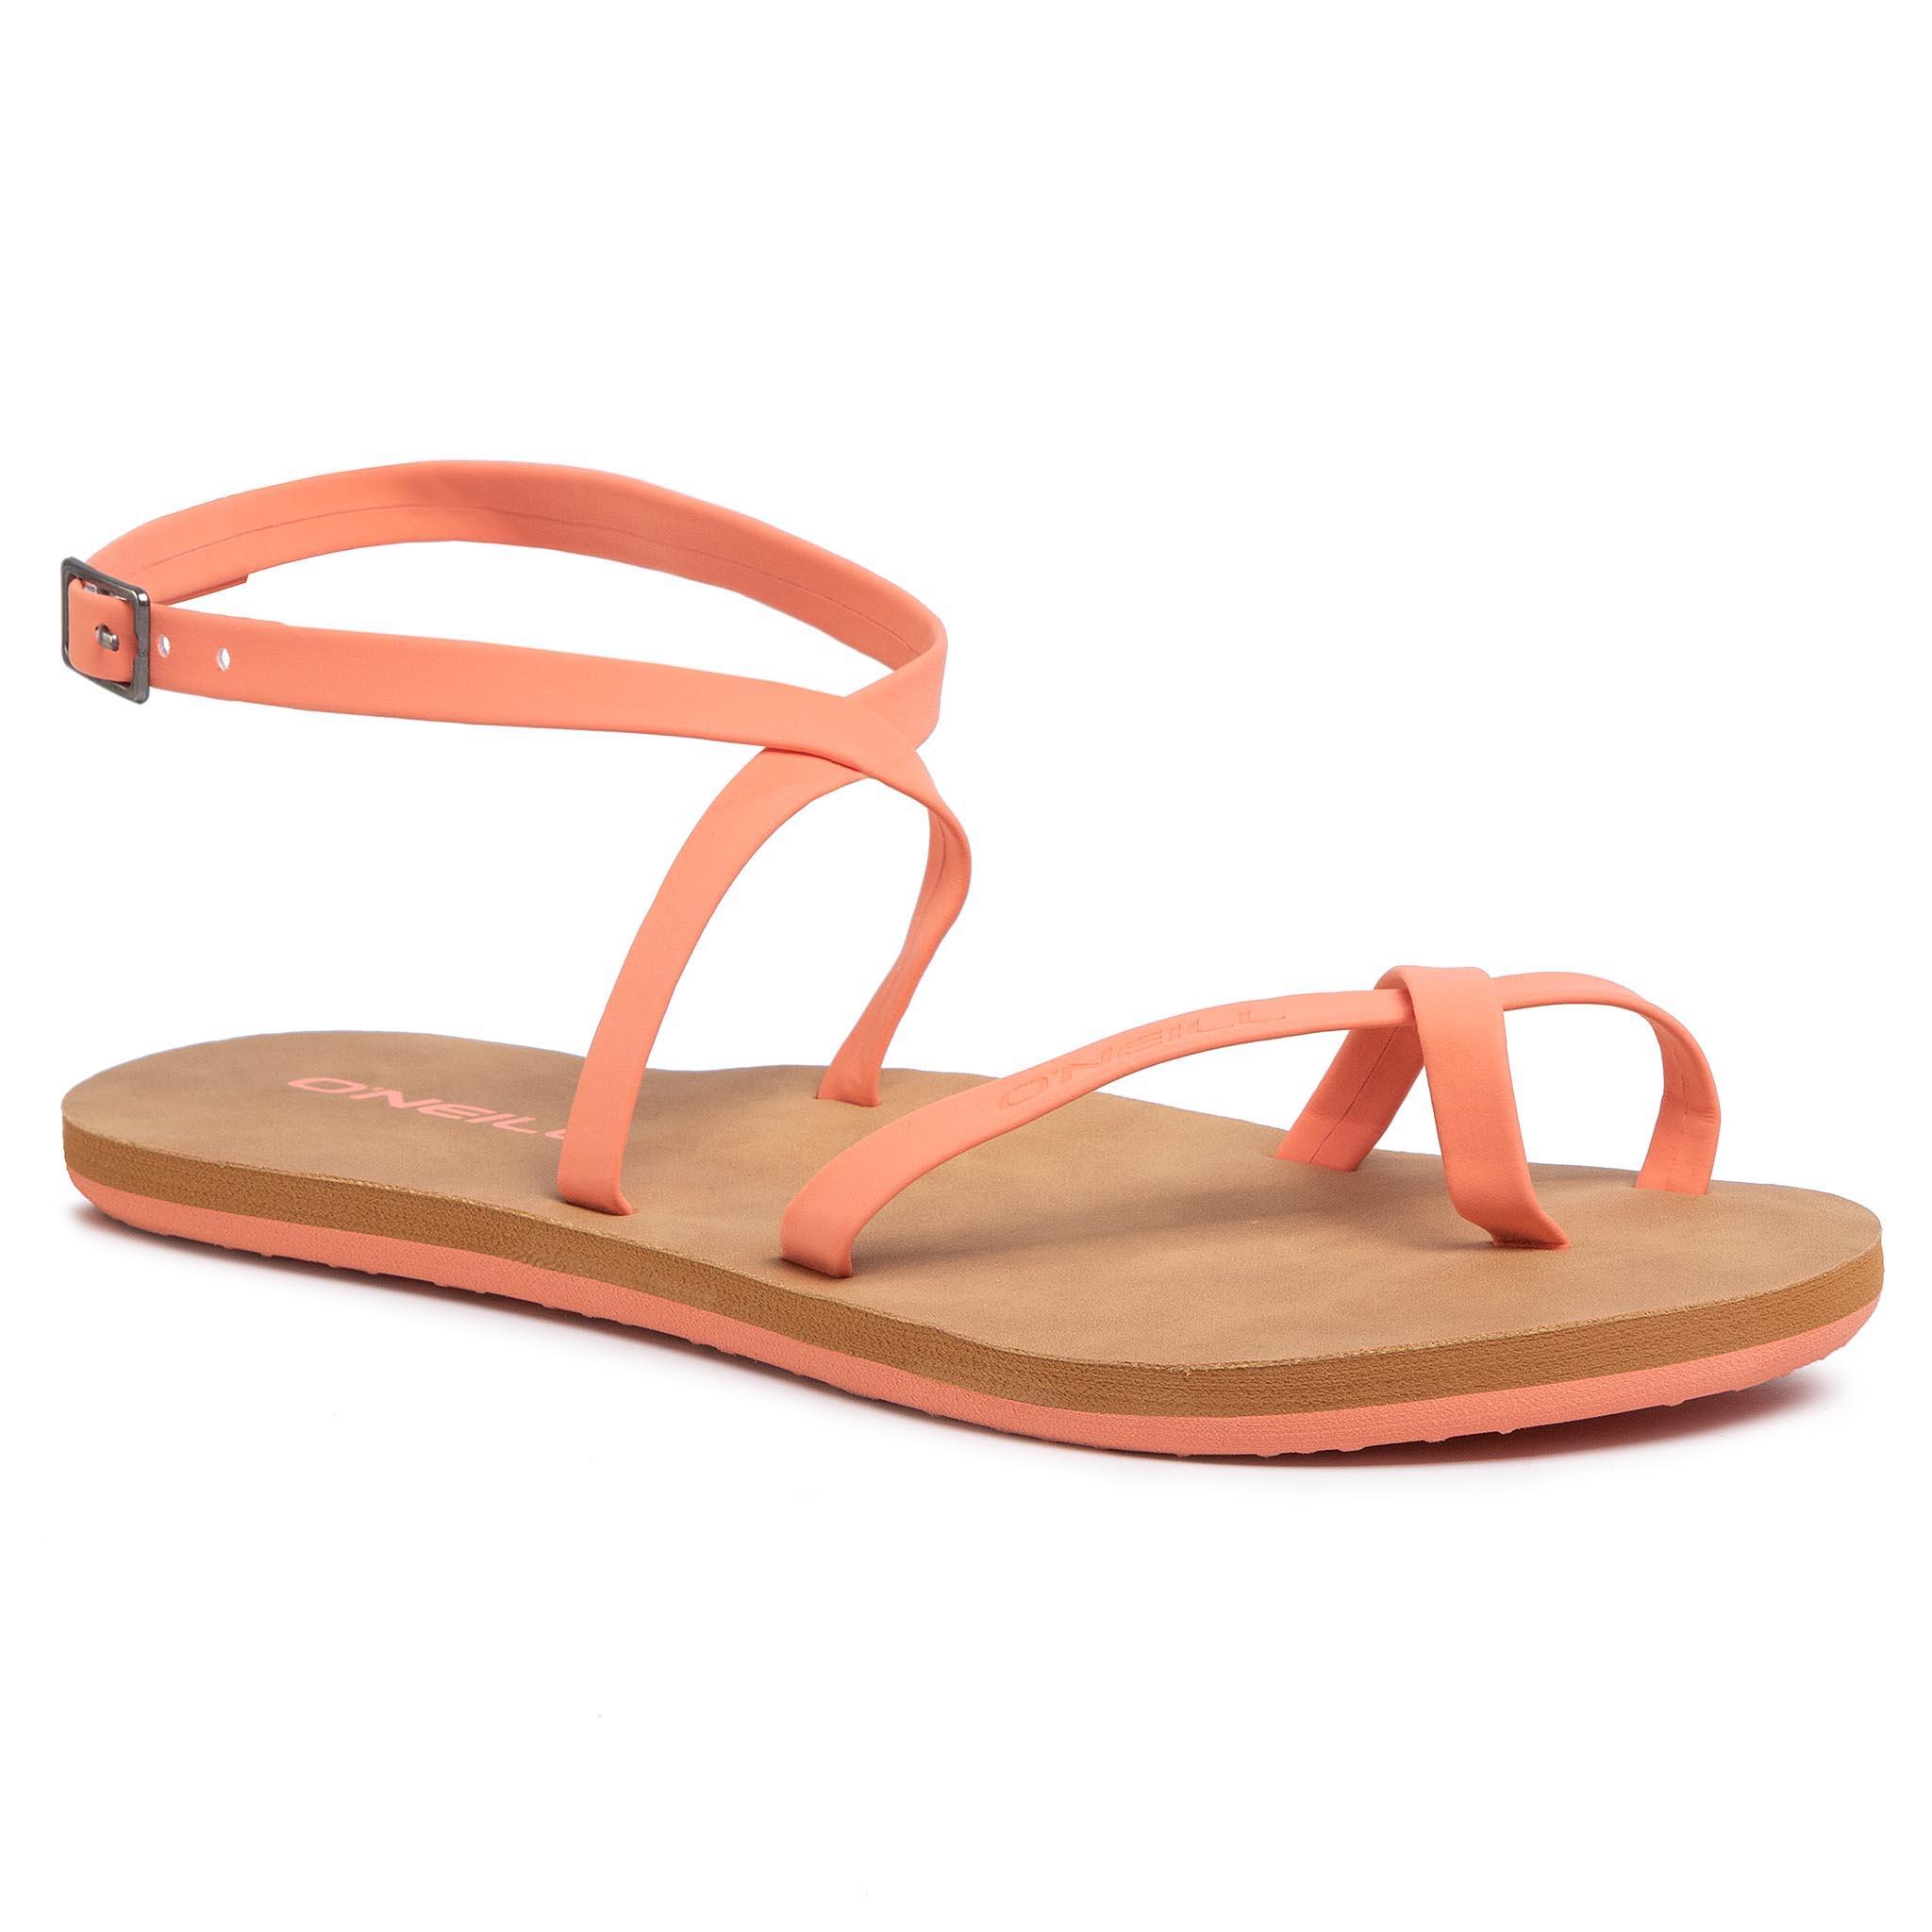 Sandále O'NEILL - Fw Batida Sun Sandals 0A9504 Mandarine 3121